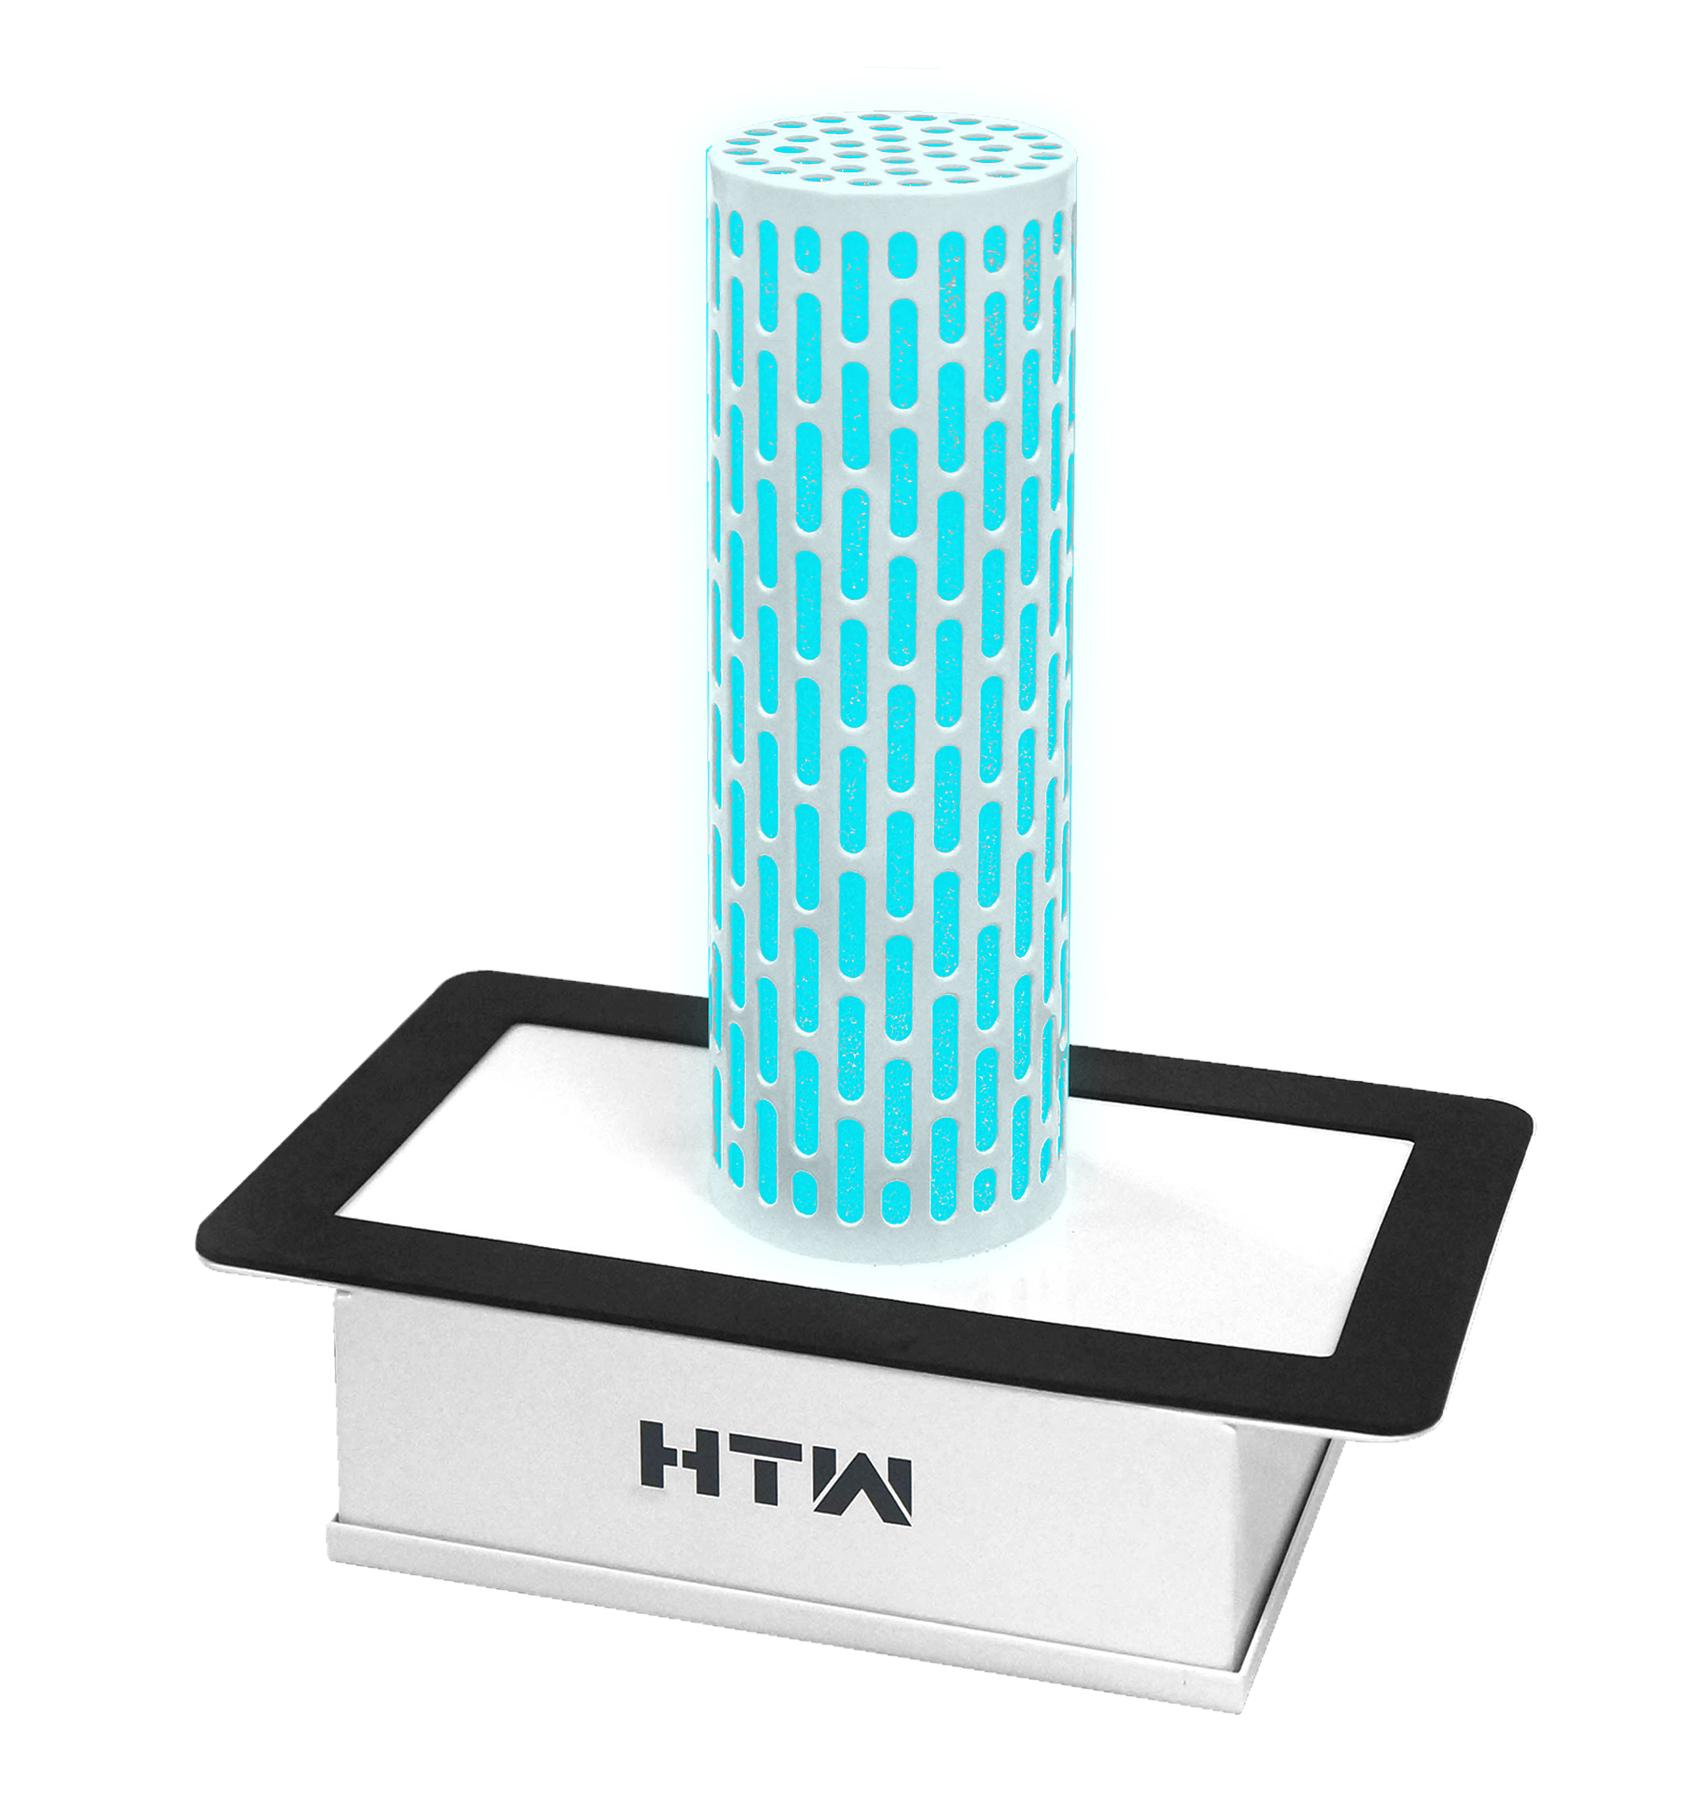 'HTW', de Gia Group, lanza su solución antivirus para conductos 'Pure Duct'